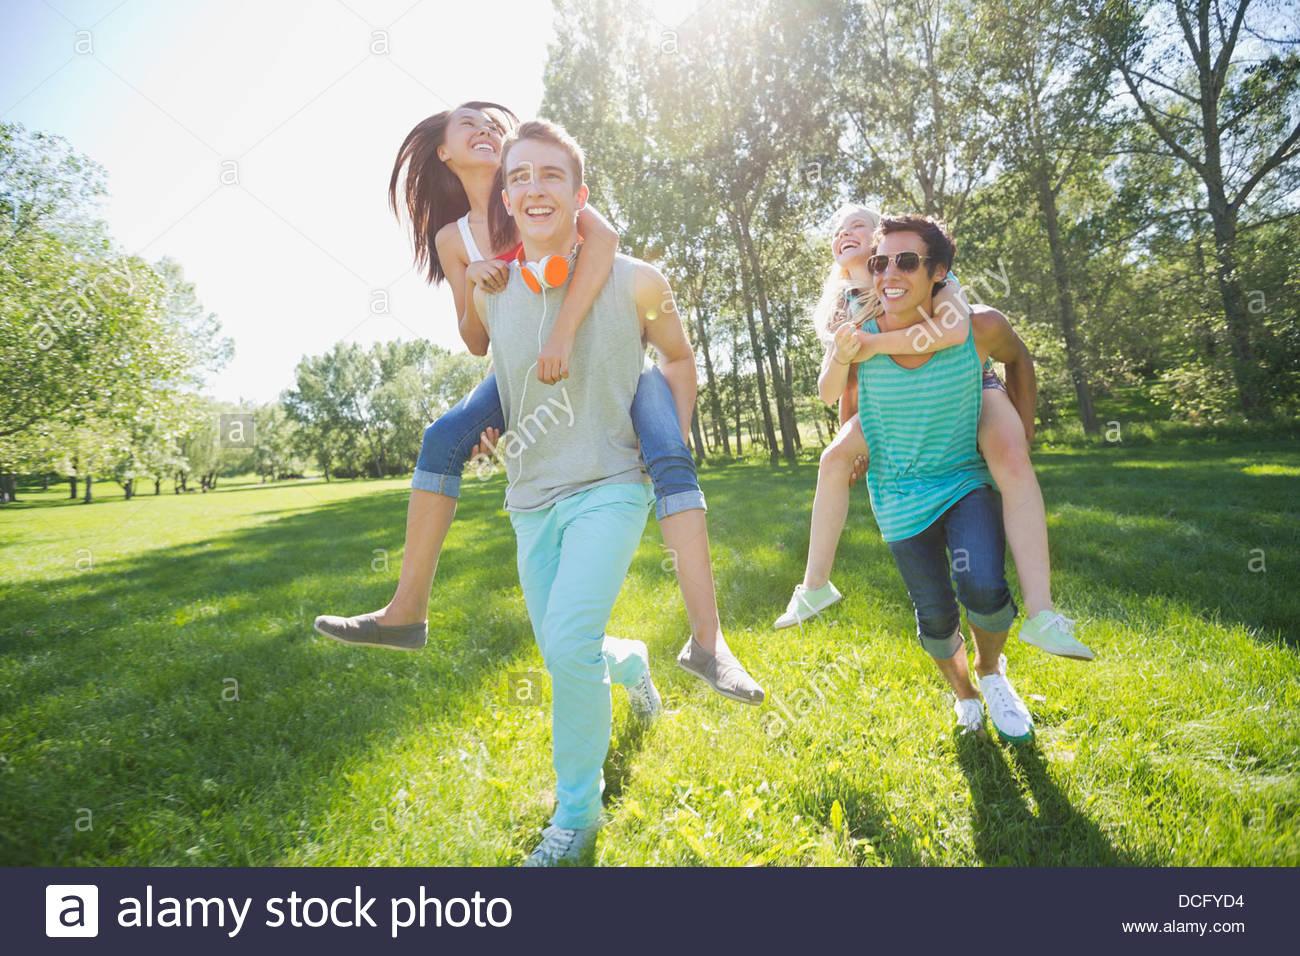 Teens giving piggyback rides - Stock Image